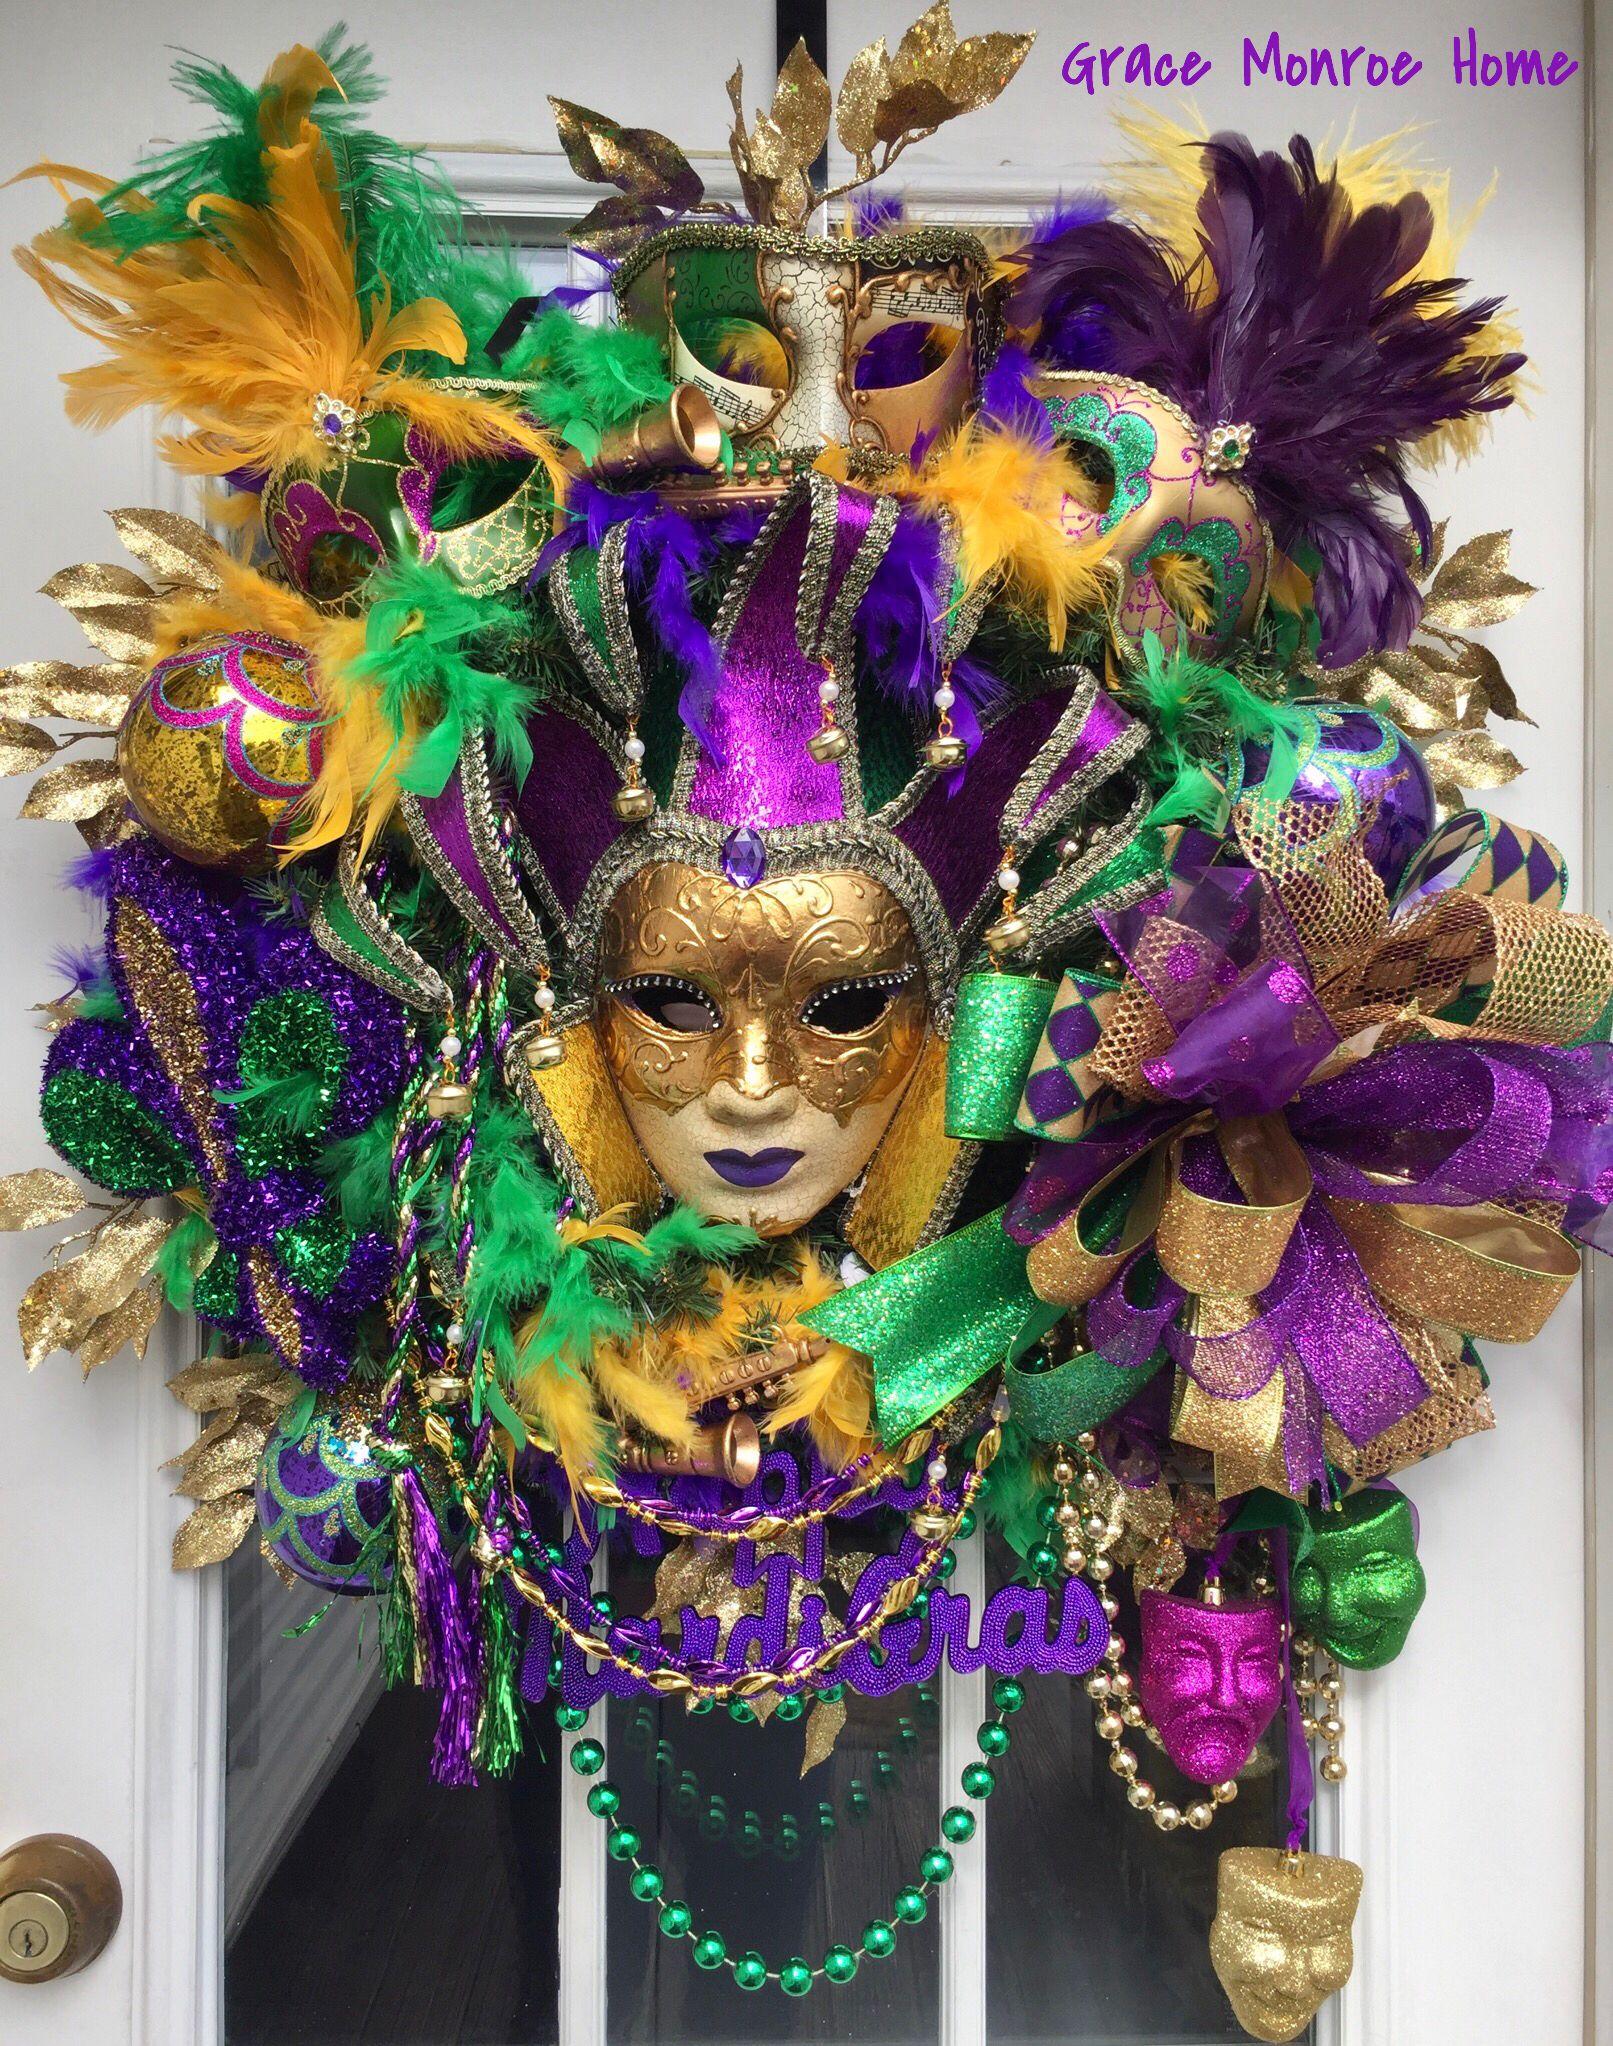 Learn To Make Wreaths Wreath Tutorials By Grace Monroe Home Mardi Gras Wreath Mardi Gras Decorations Mardi Gras Crafts